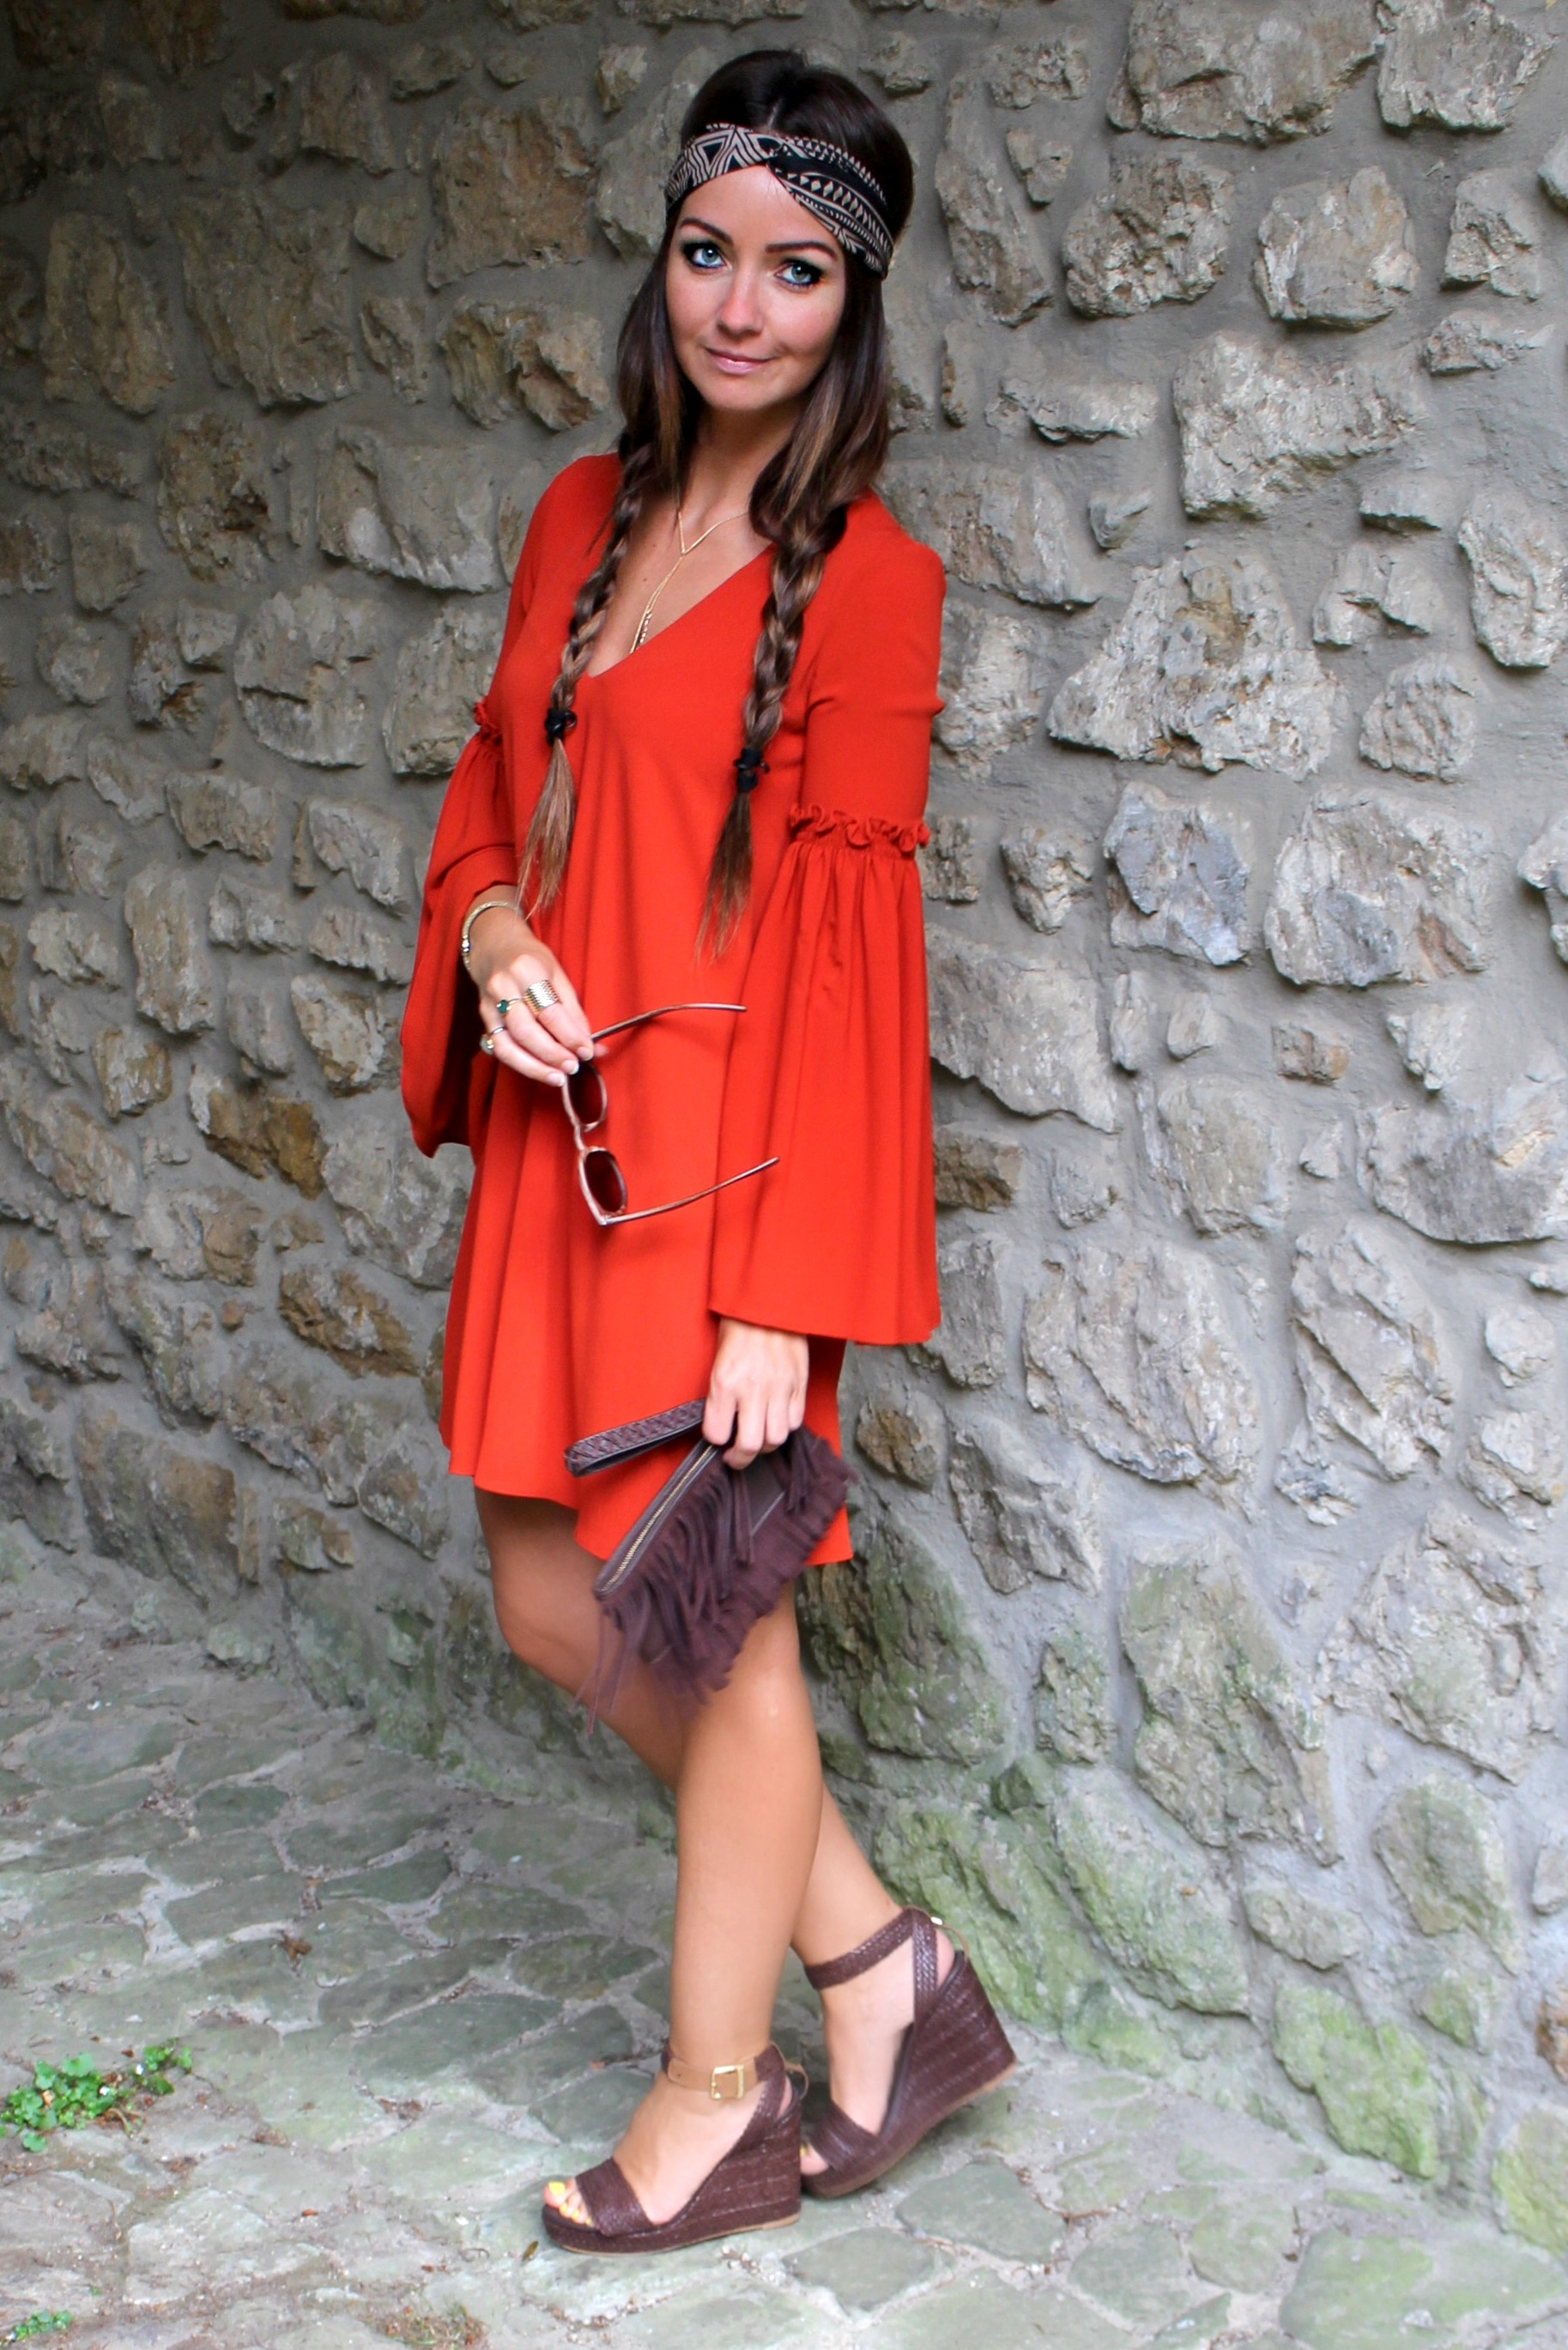 Fashioncircuz by Jenny img_0402a HIPPIEGIRL IN RED